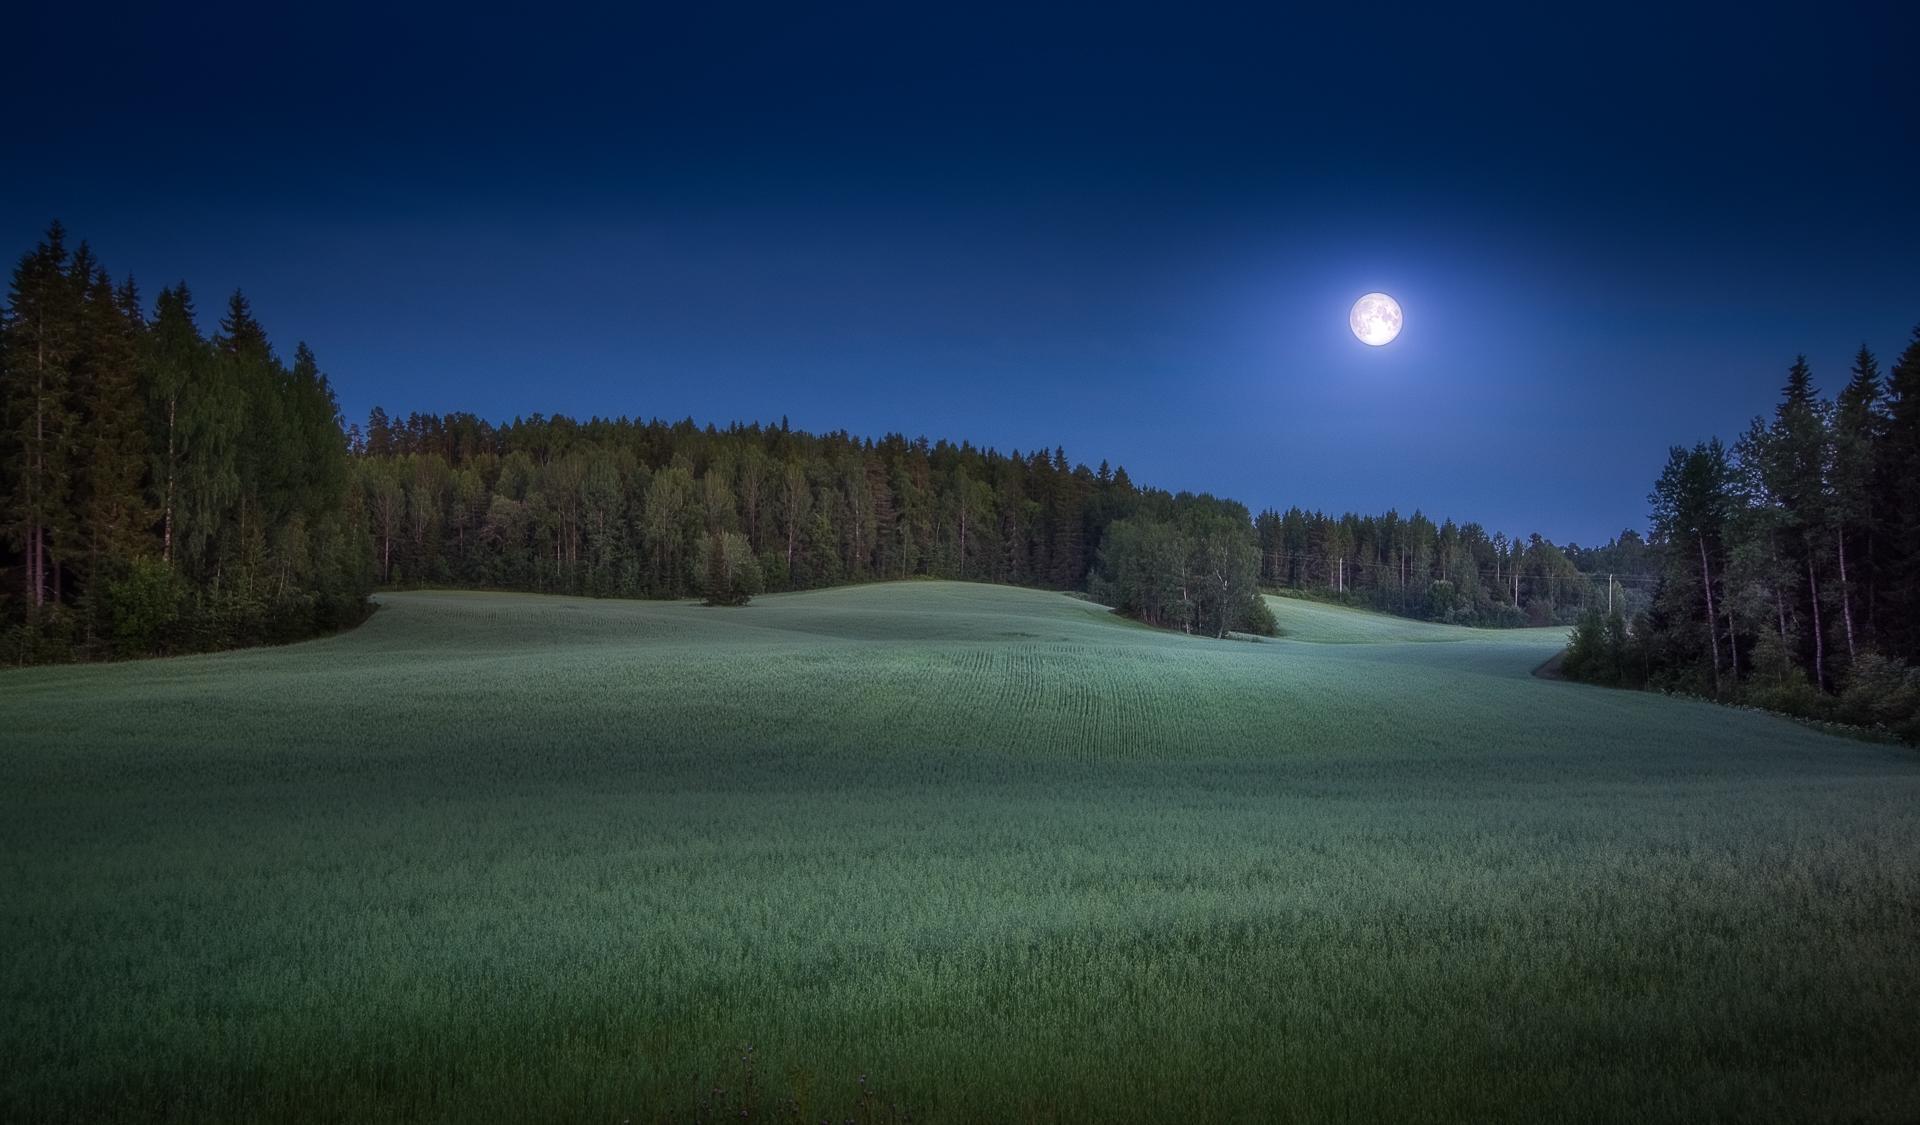 обои поле, луна, лес, деревья картинки фото